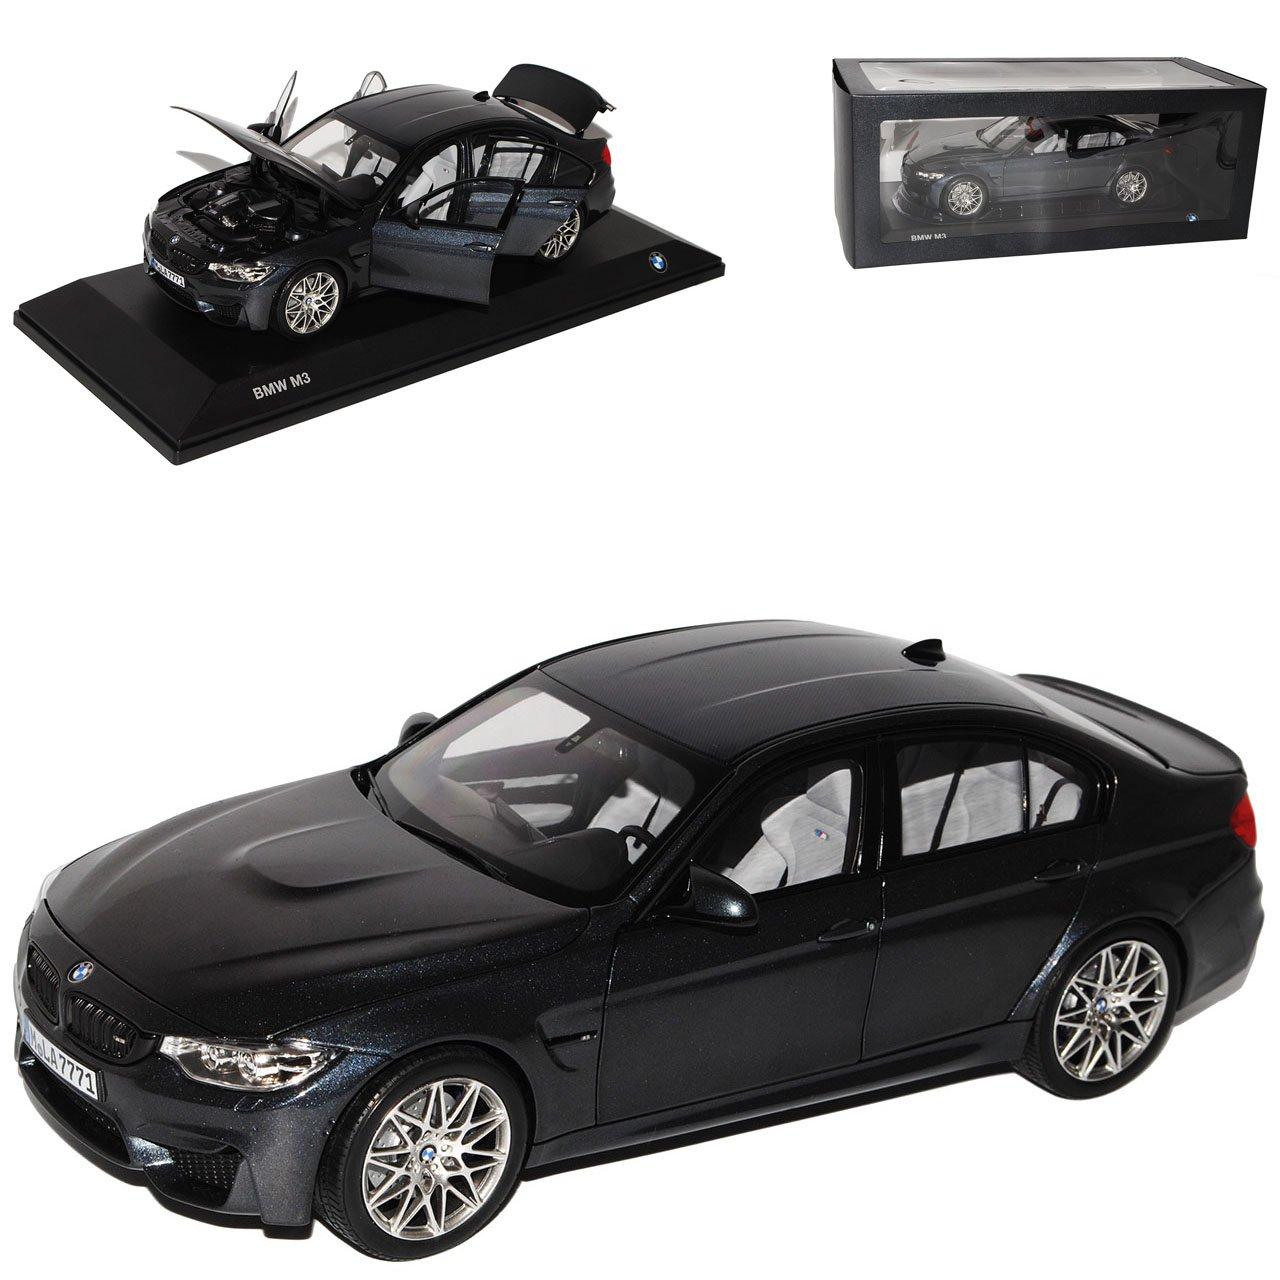 Norev BMW 3er M3 F80 Limousine Mineral Grau Schwarz Generation F30 Ab 2011 1/18 Modell Auto